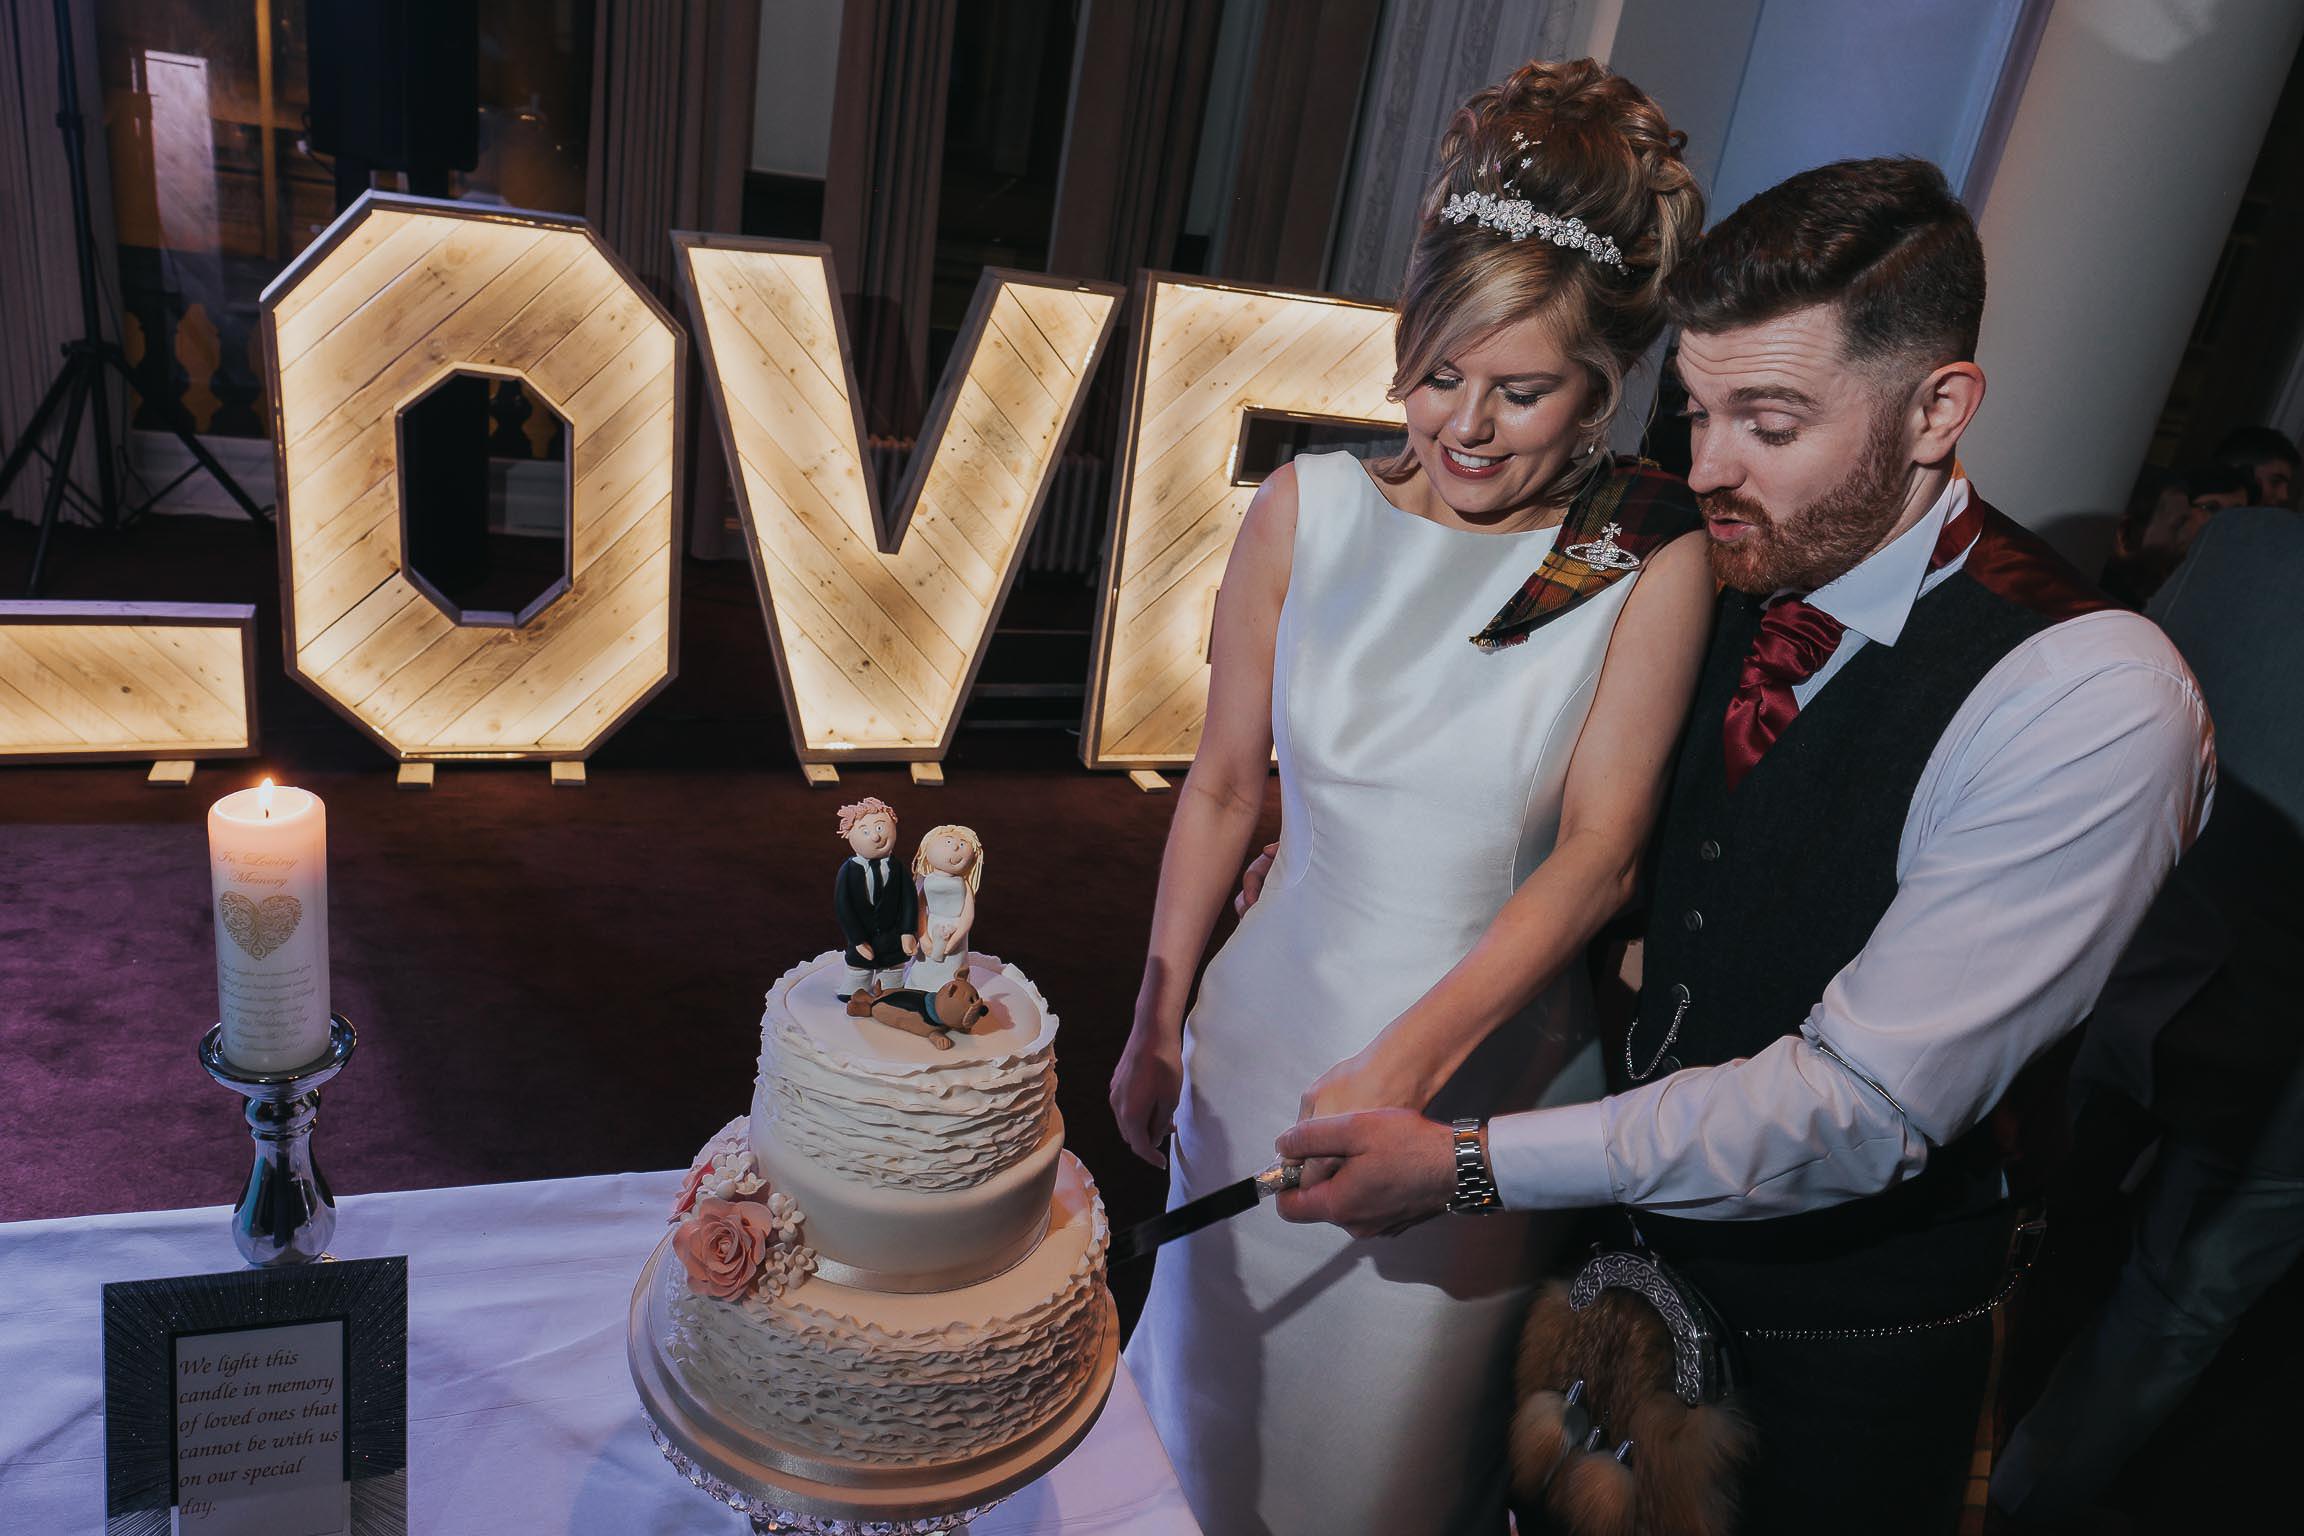 bride and groom cutting their wedding cake on their wedding day